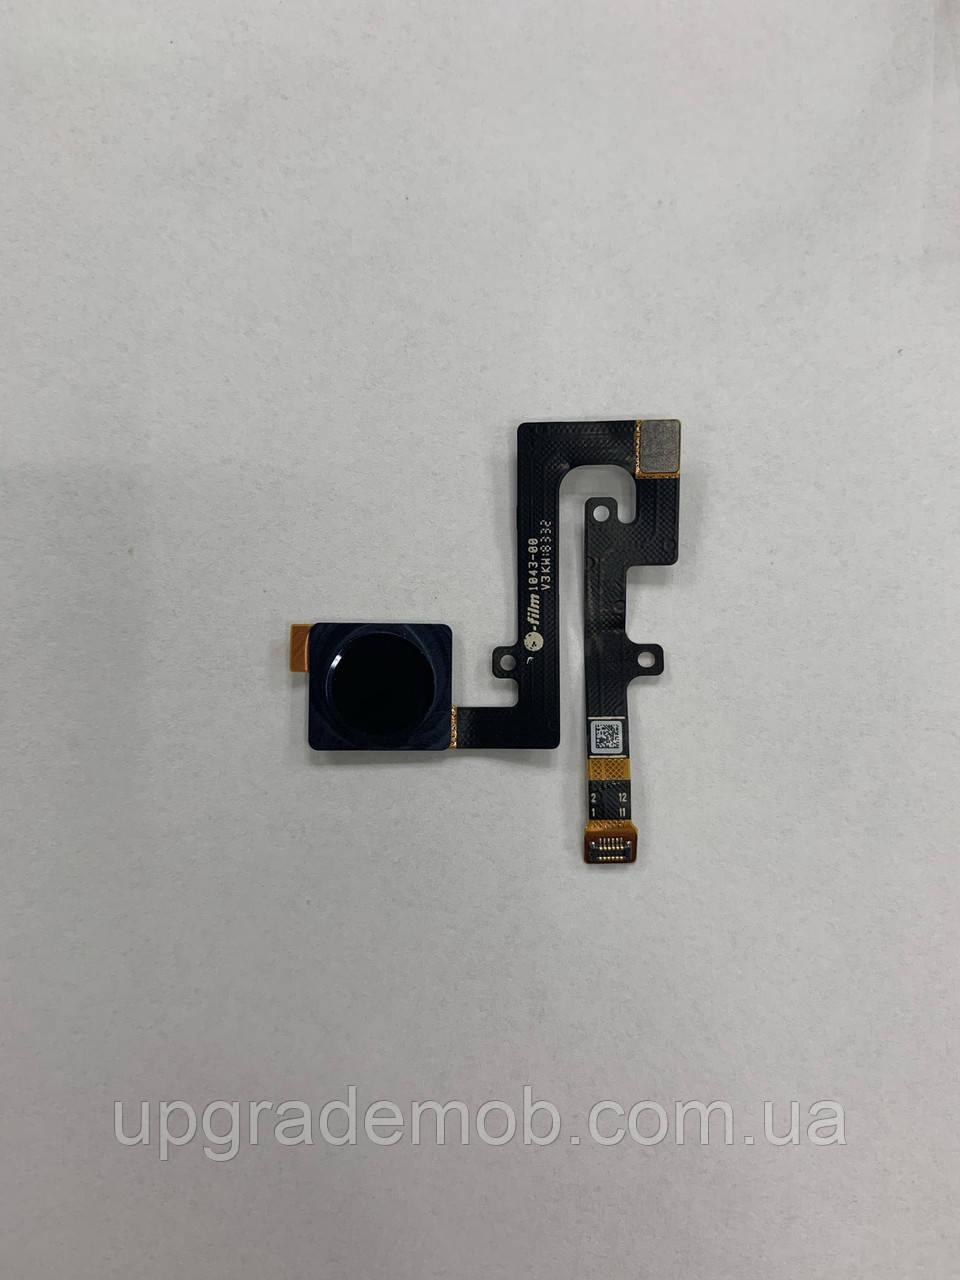 Шлейф Nokia 6.1 Plus TA-1083/TA-1116/TA-1103, Nokia X6 2018 TA-1099, с сканером отпечатка пальца, черного